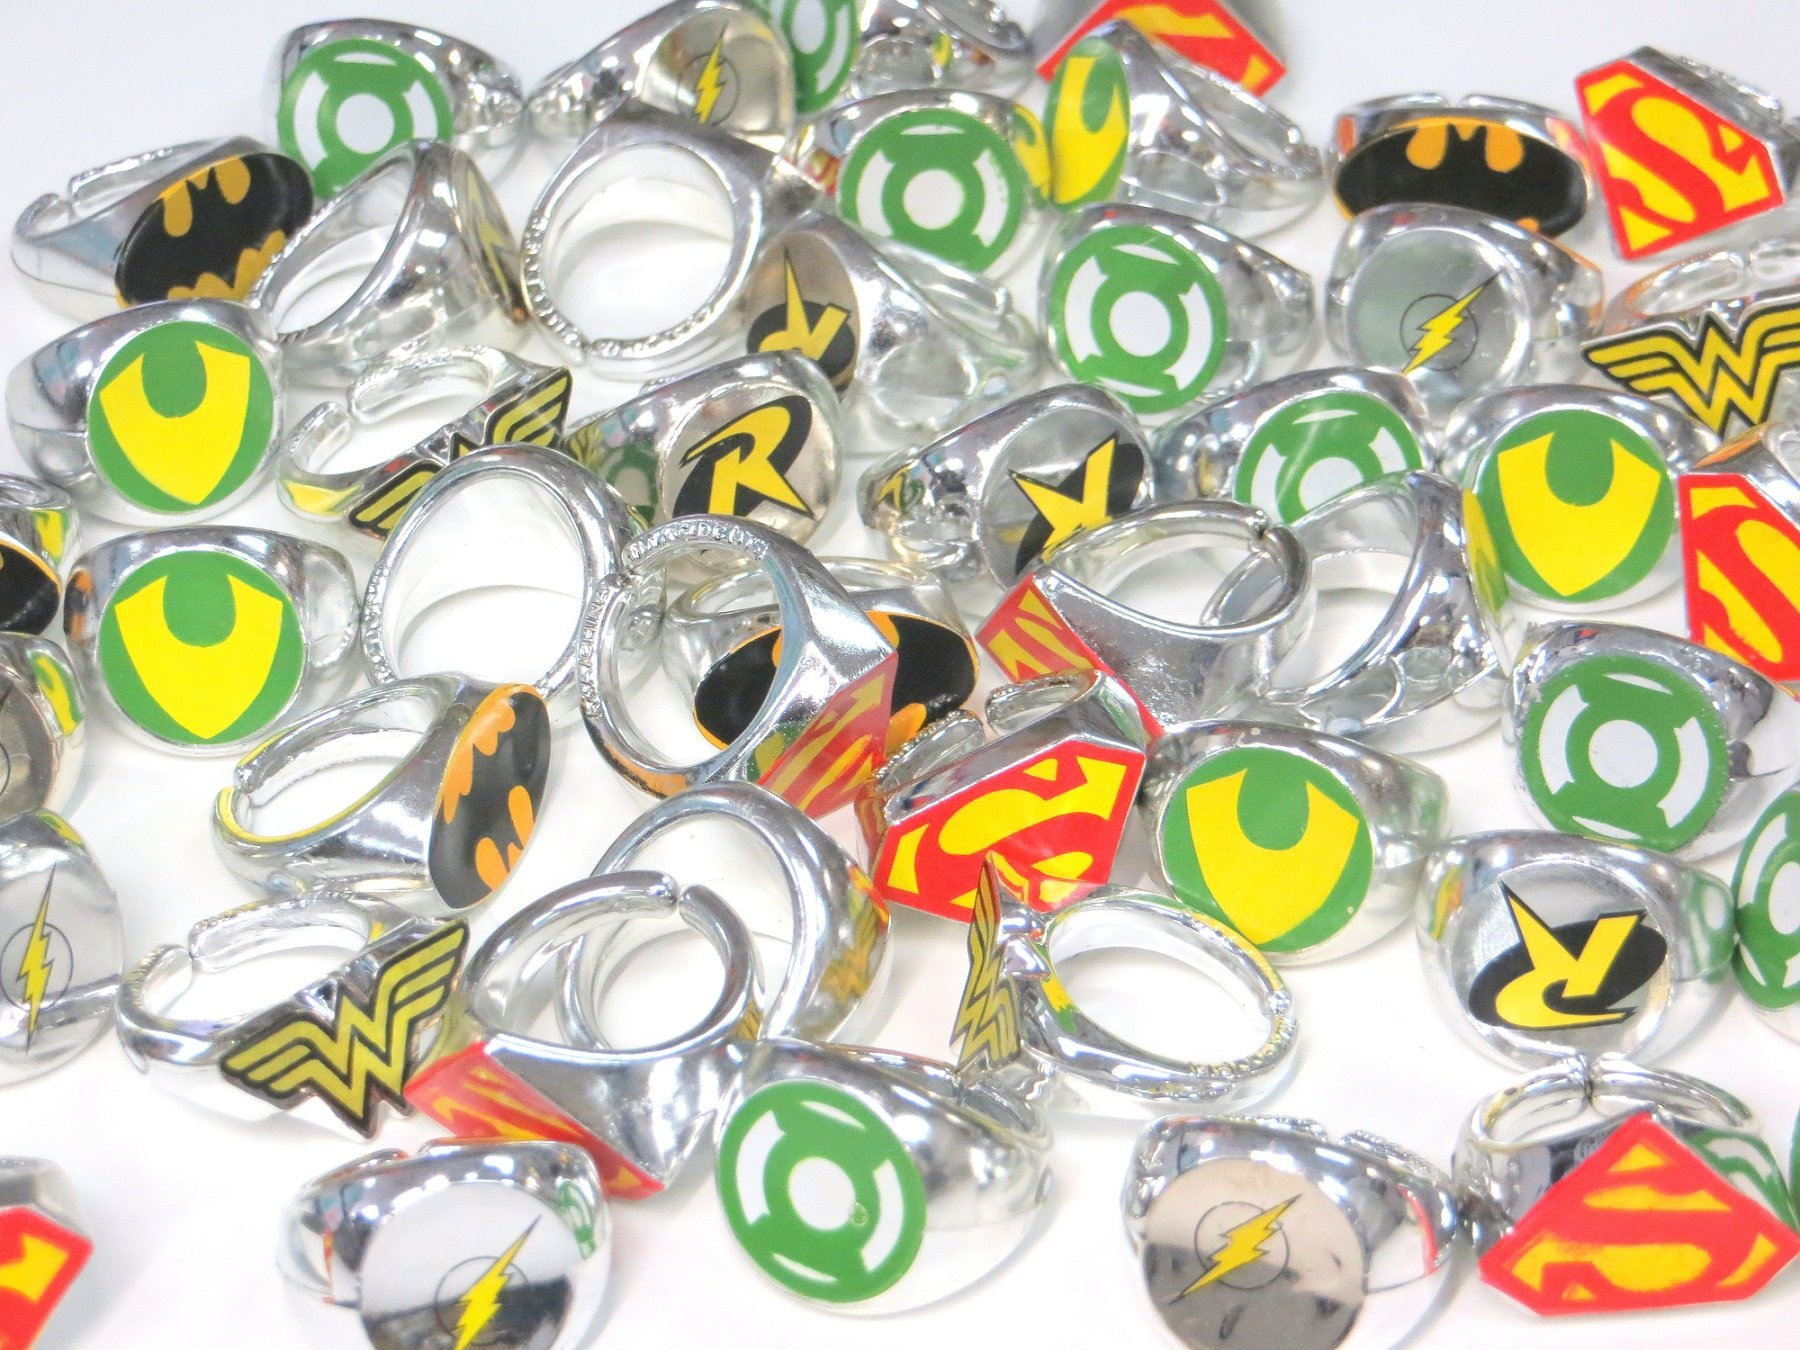 DC Superhero Novelty Power Rings 4 Dozen (48 Rings) by DC Comics